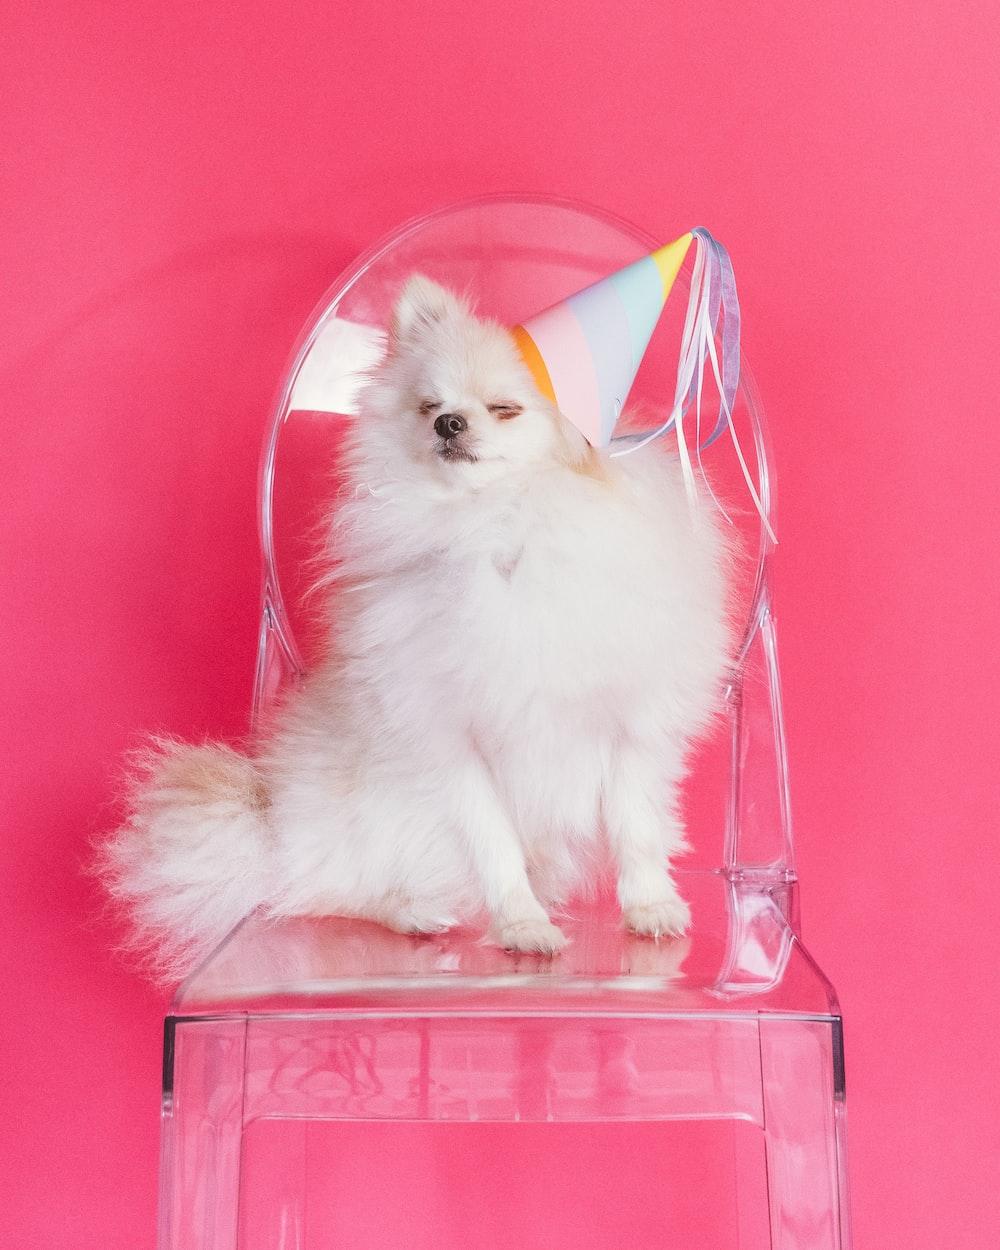 white pomeranian puppy in pink basket